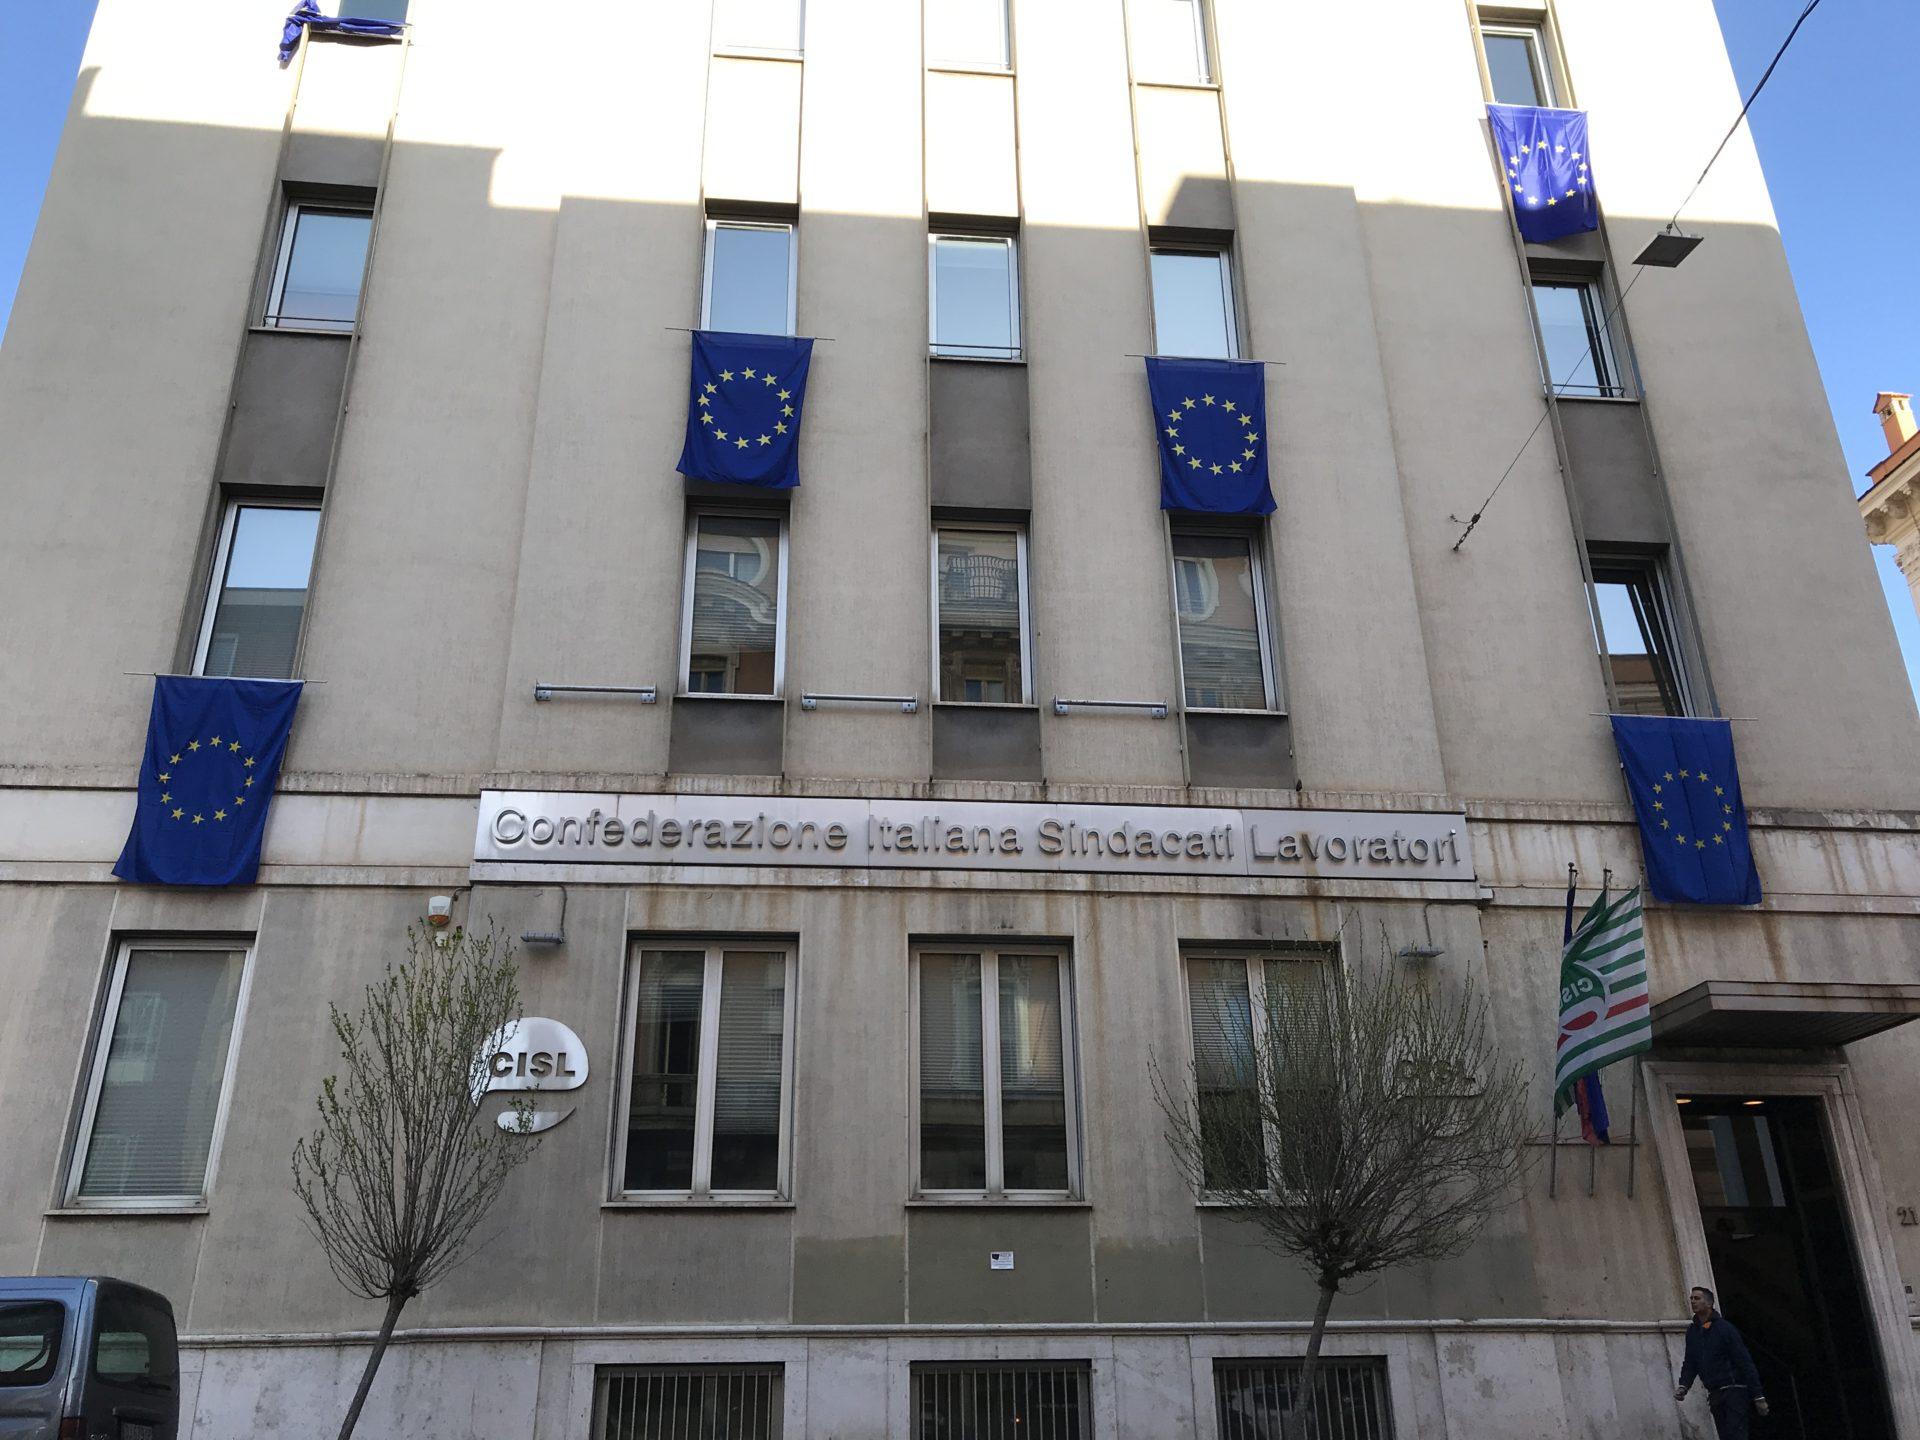 Bandiere Europa sede Cisl Roma